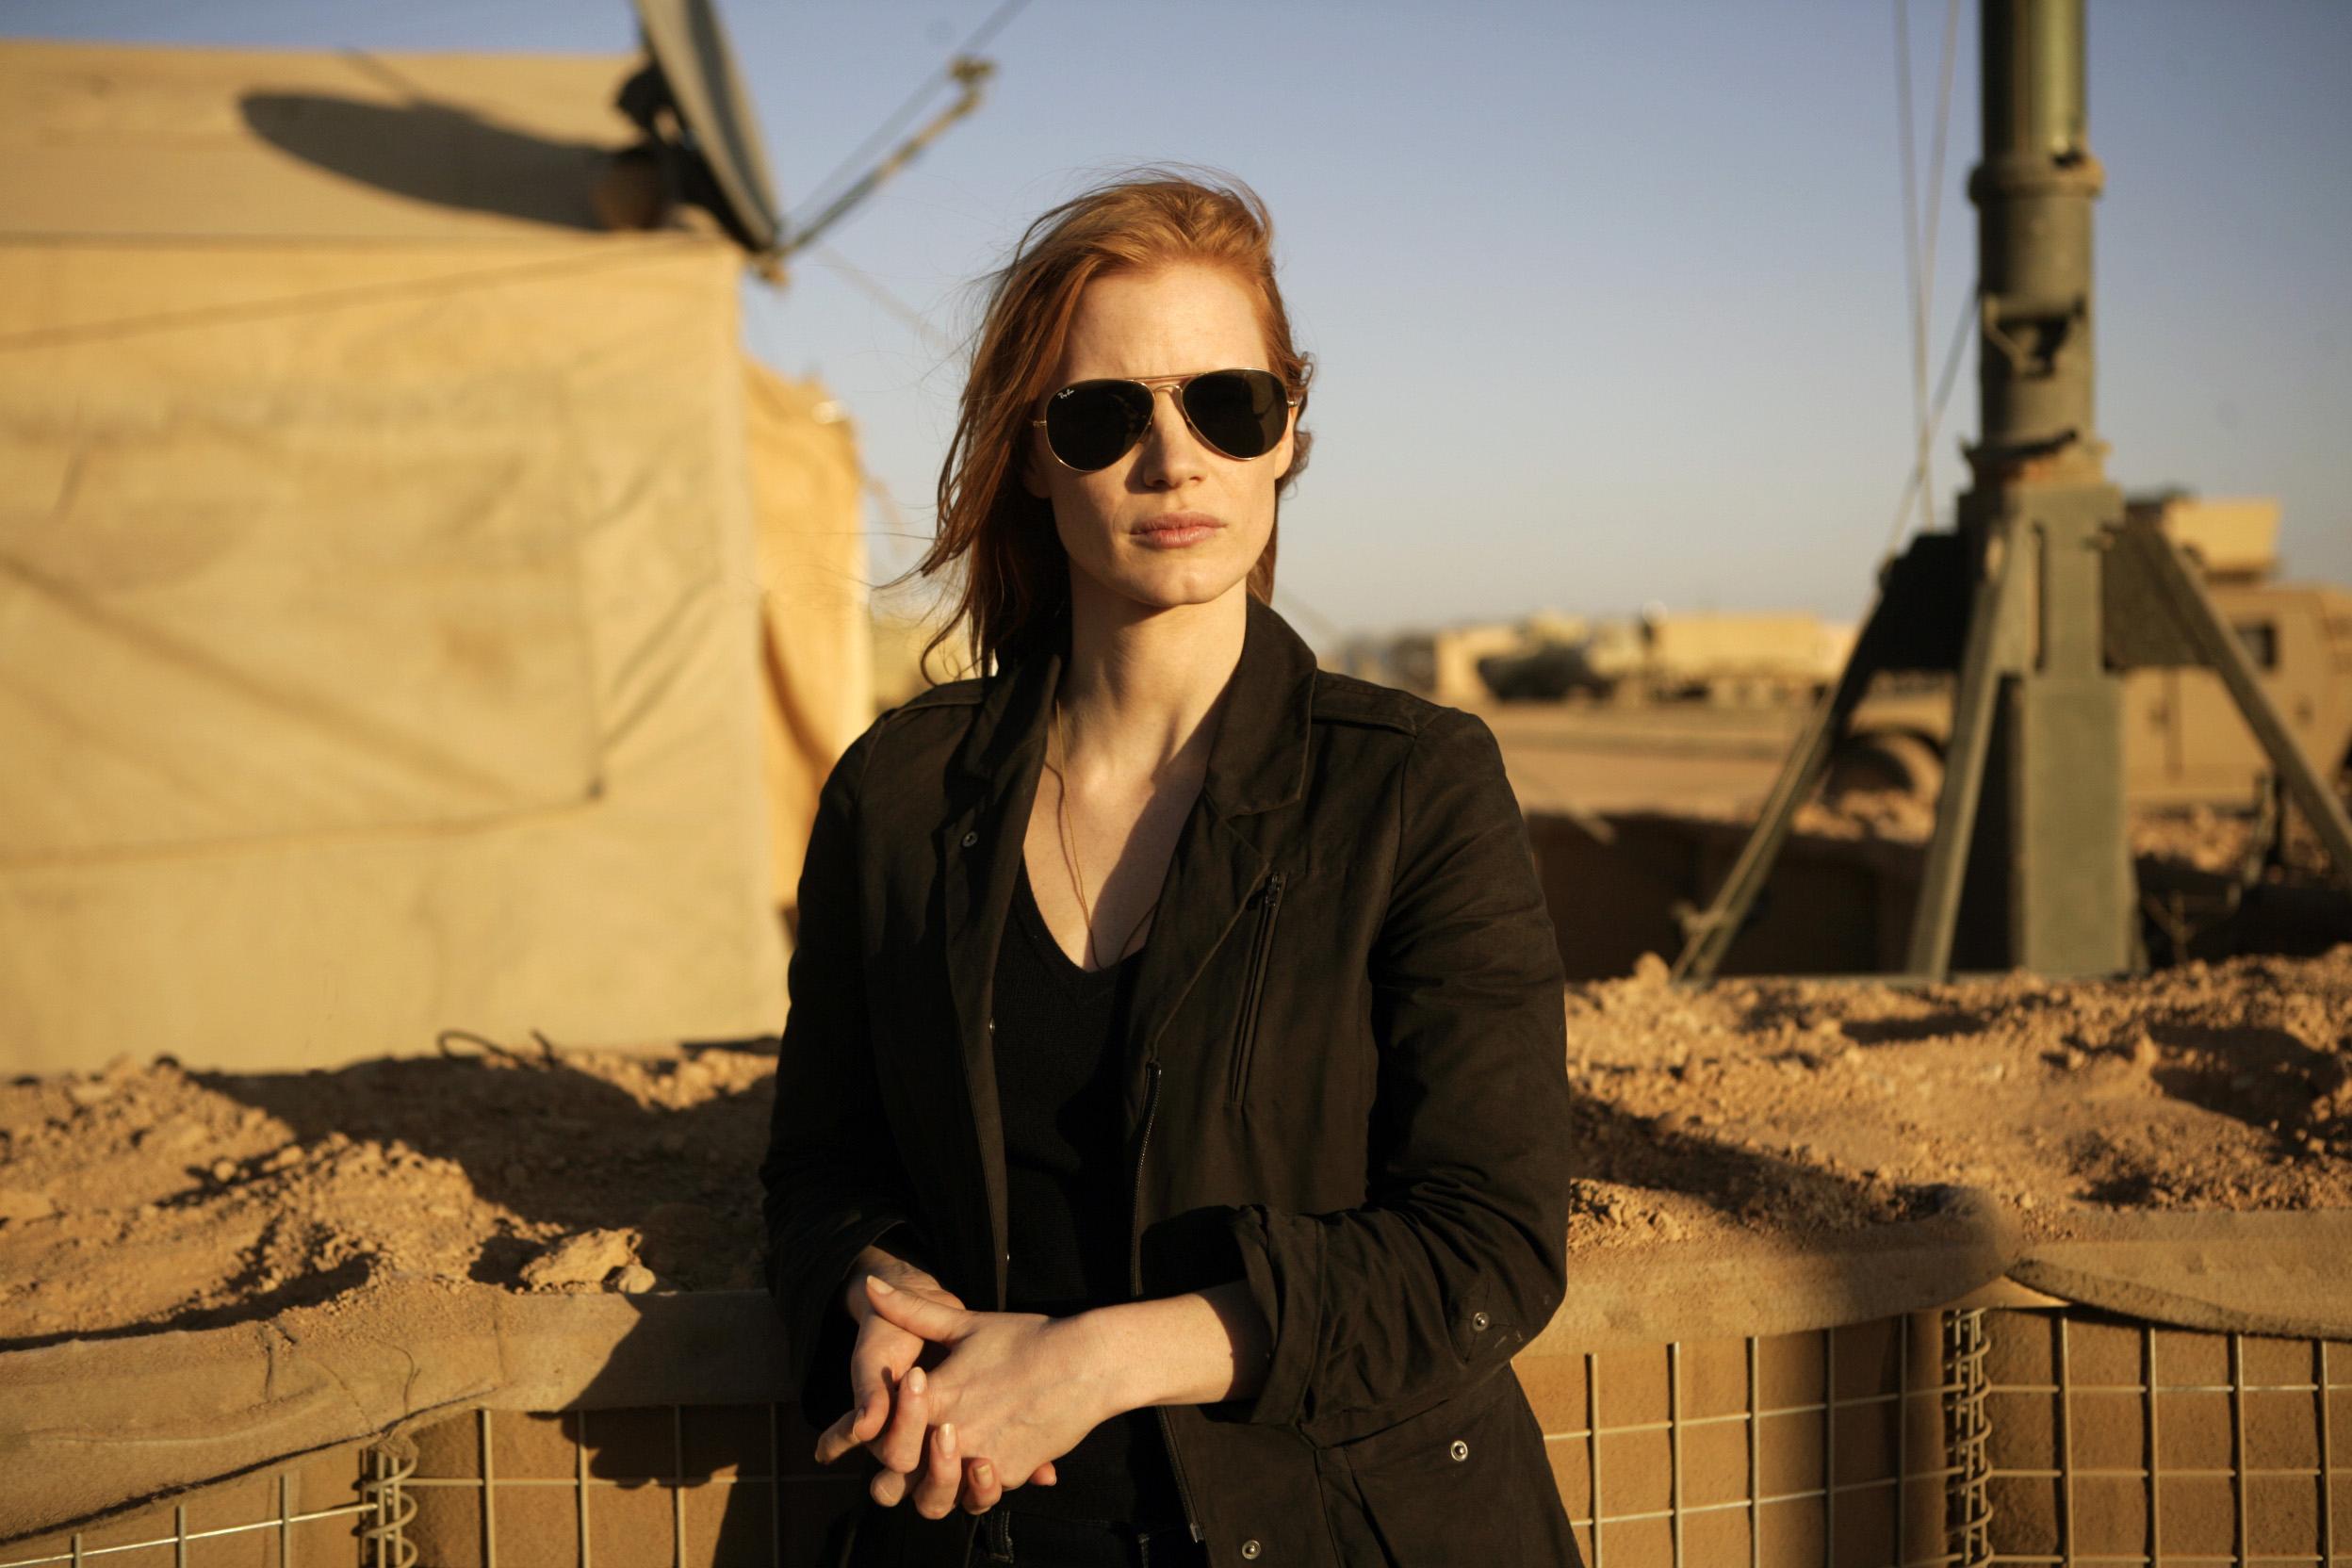 New trailer released for Golden Globe nominee Zero Dark Thirty